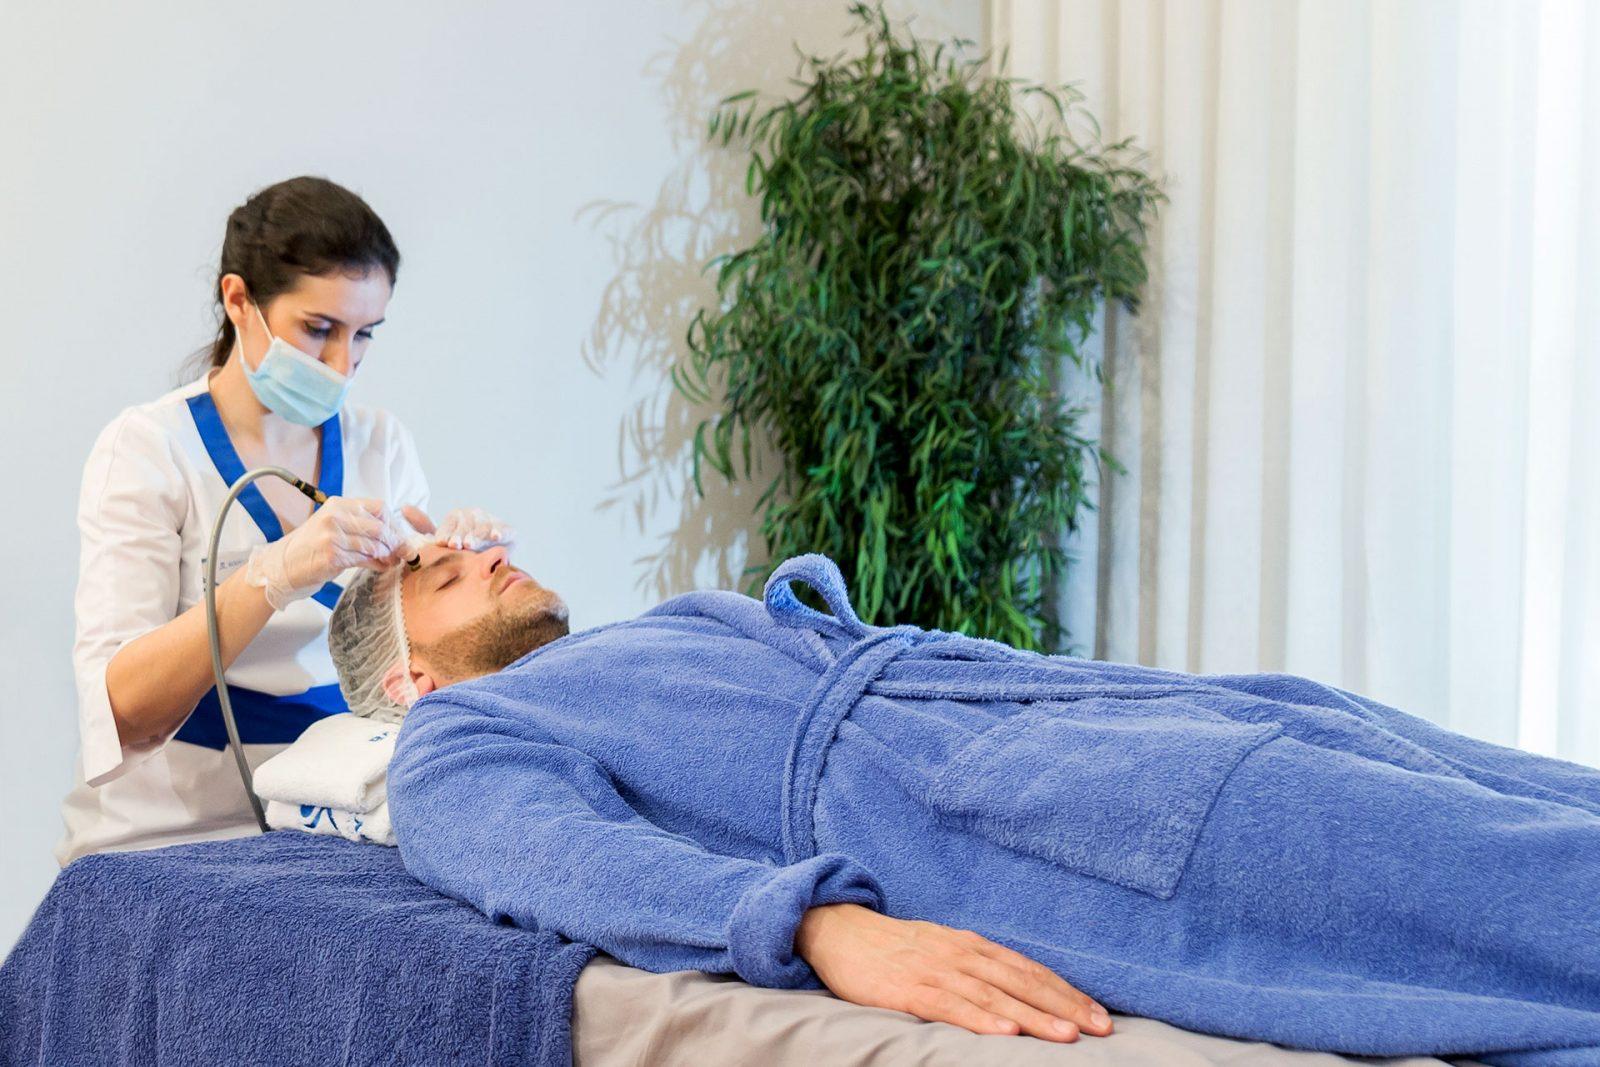 bodyscience-clinica-estetica-tratamentos-rosto-microdermoabrasao